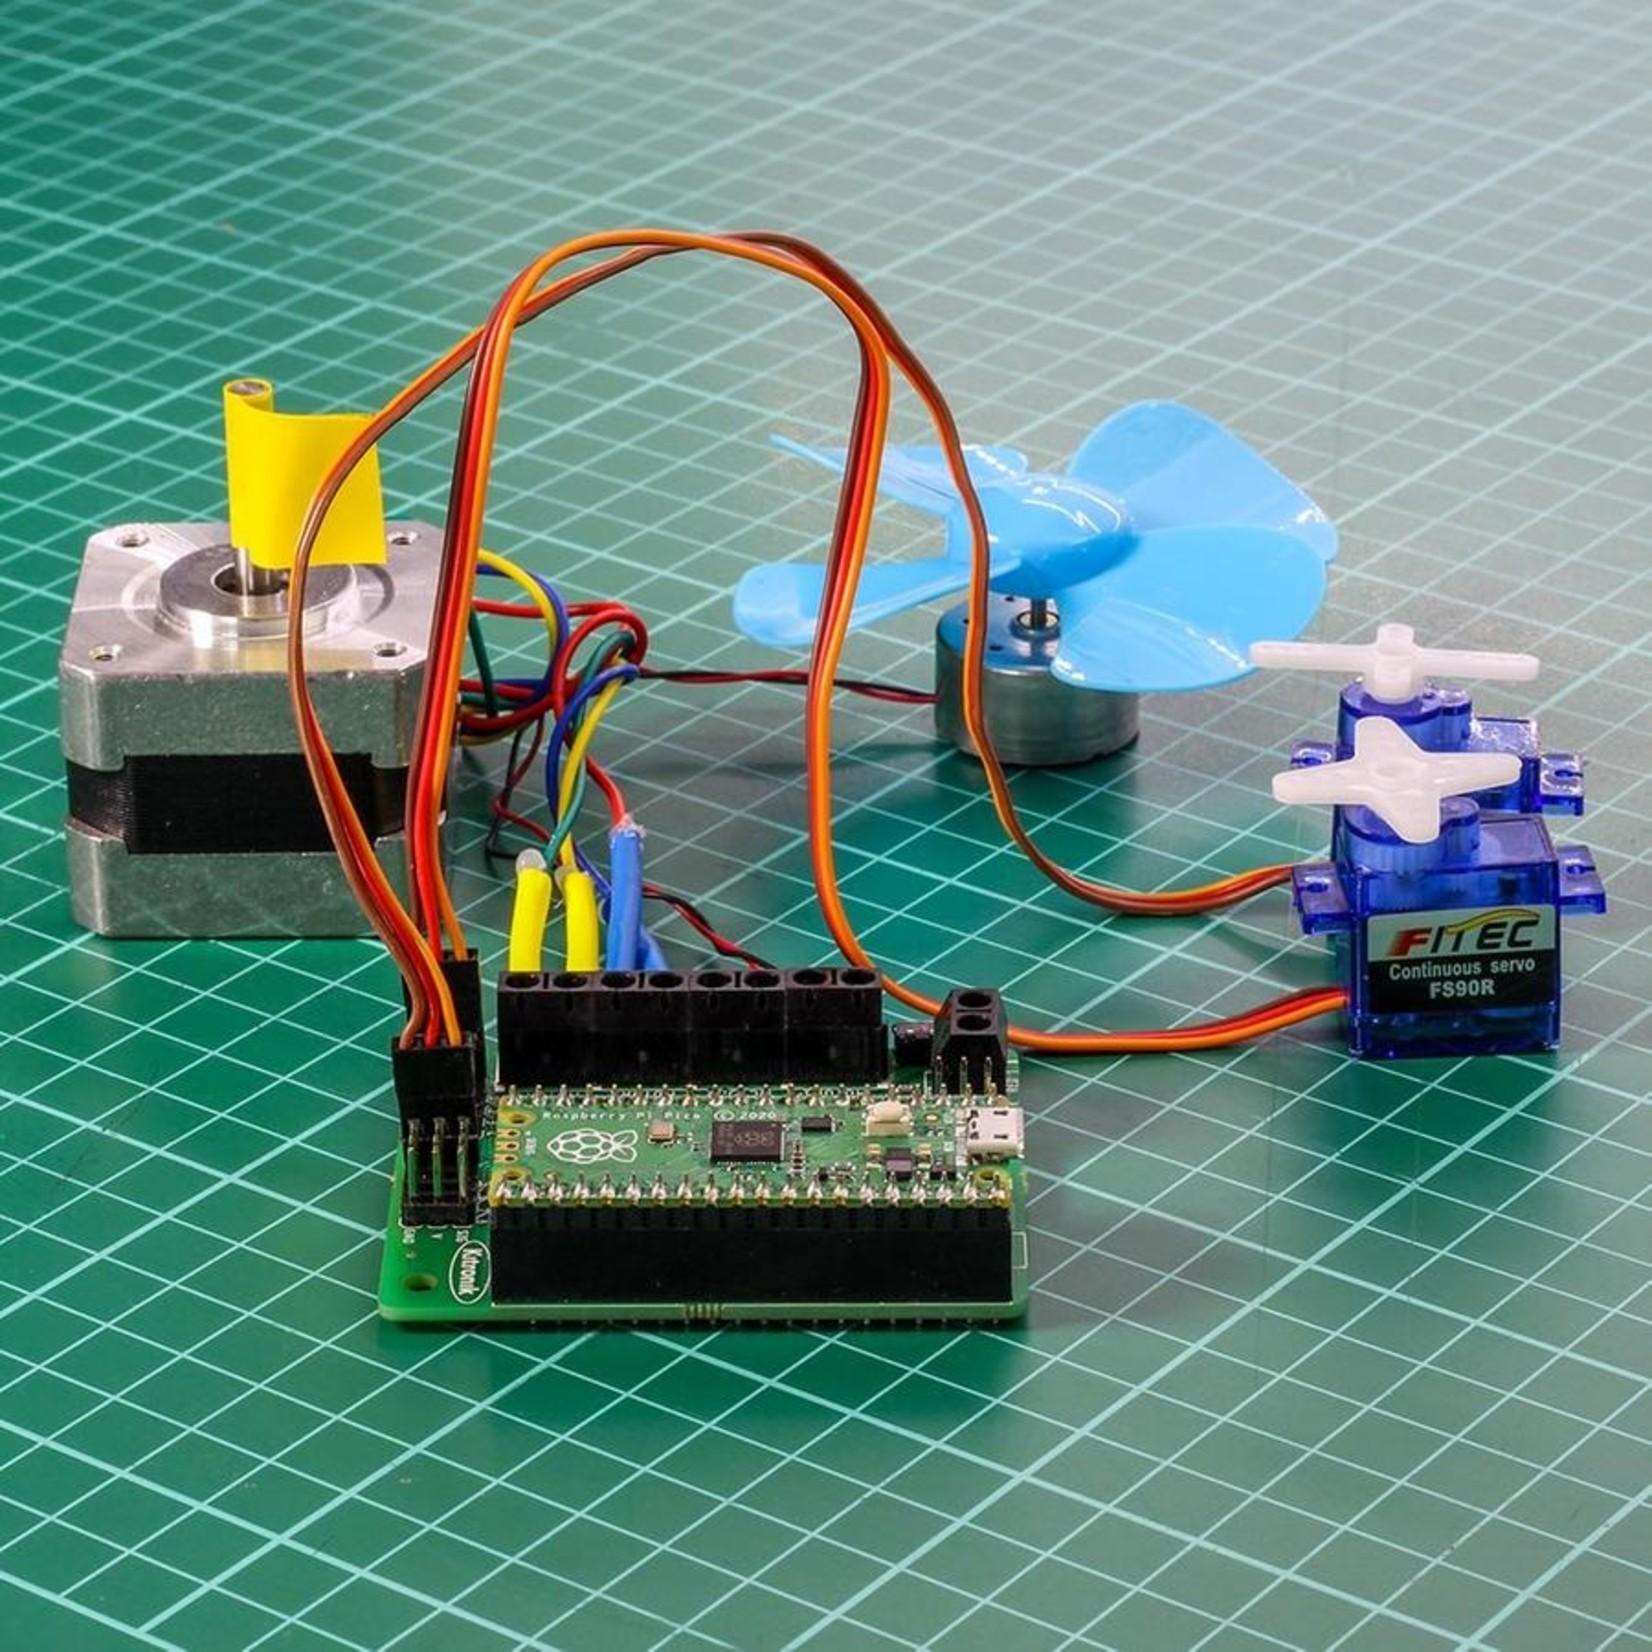 Kitronik Robotics Board for Raspberry Pi Pico